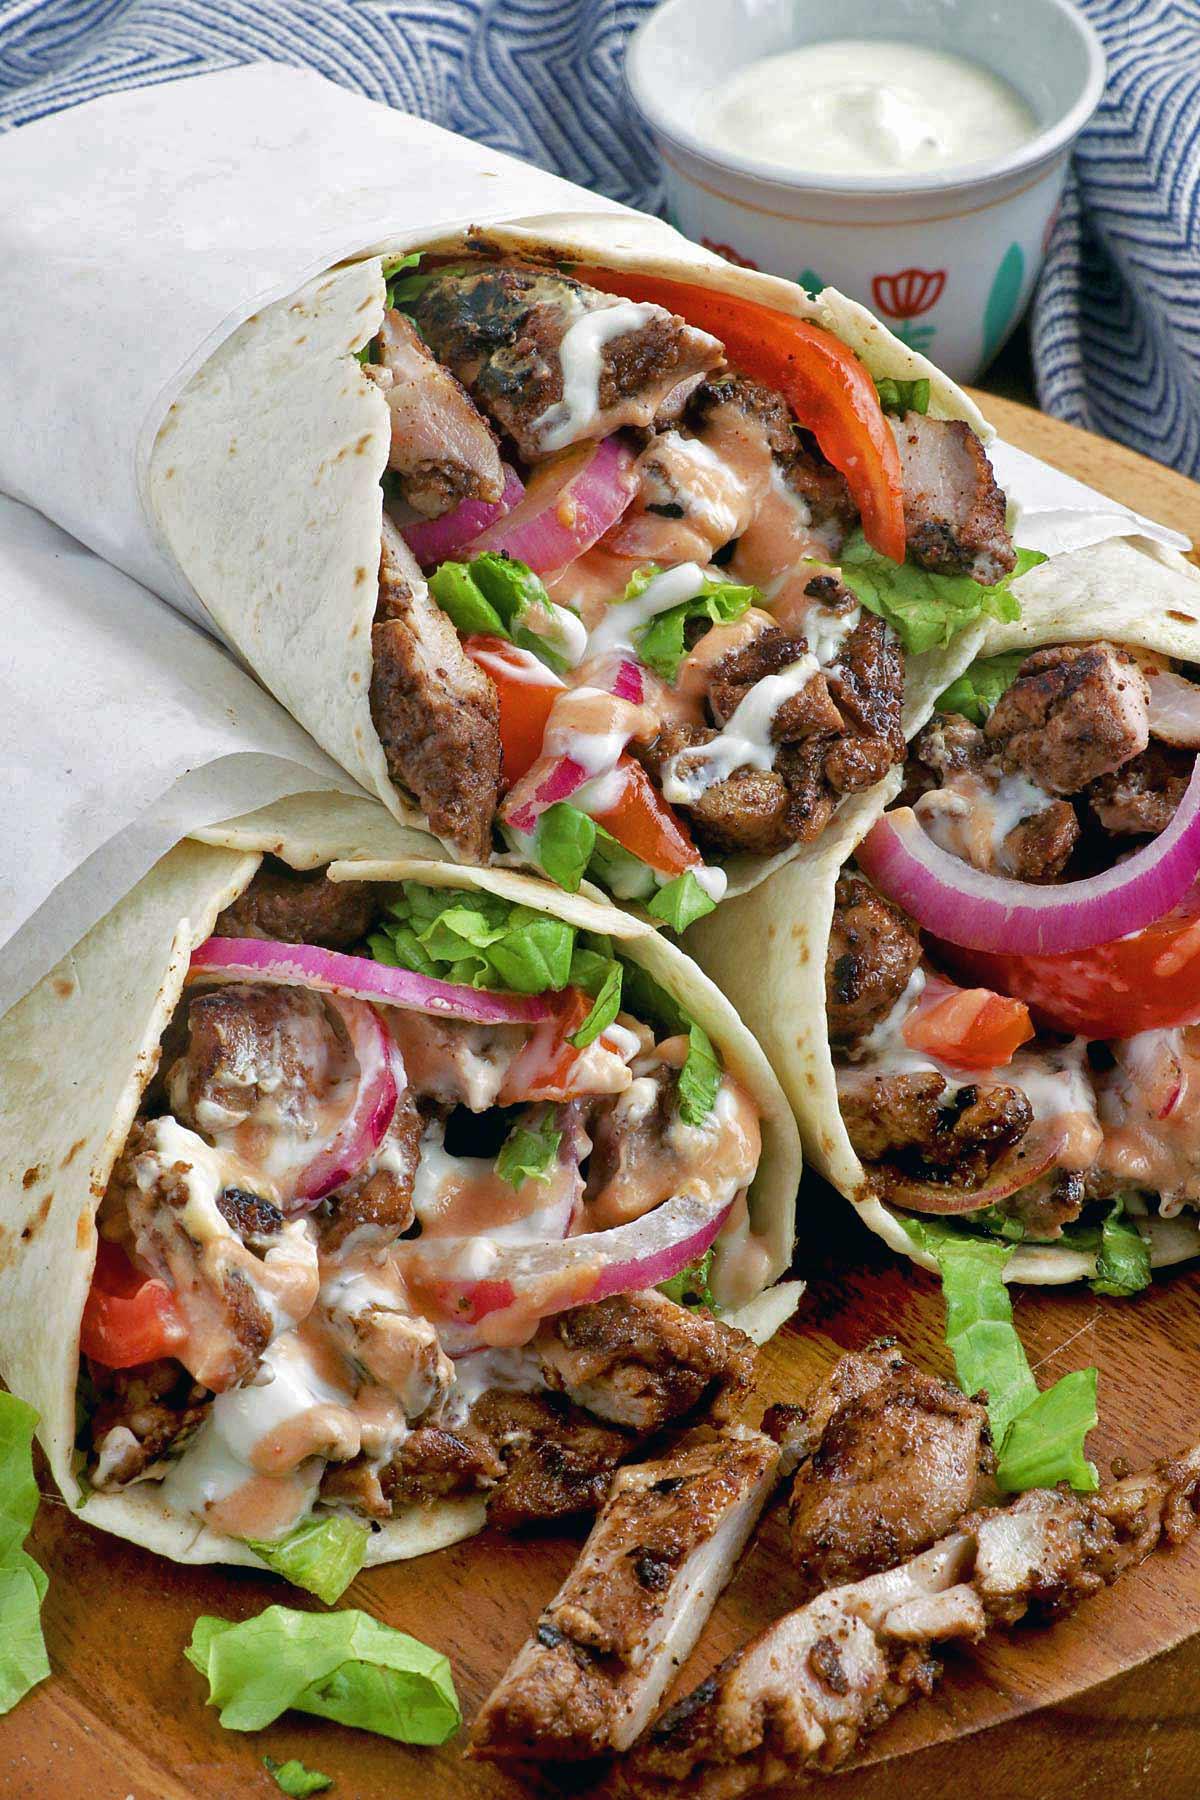 Chicken Shawarma with yogurt-garlic sauce.